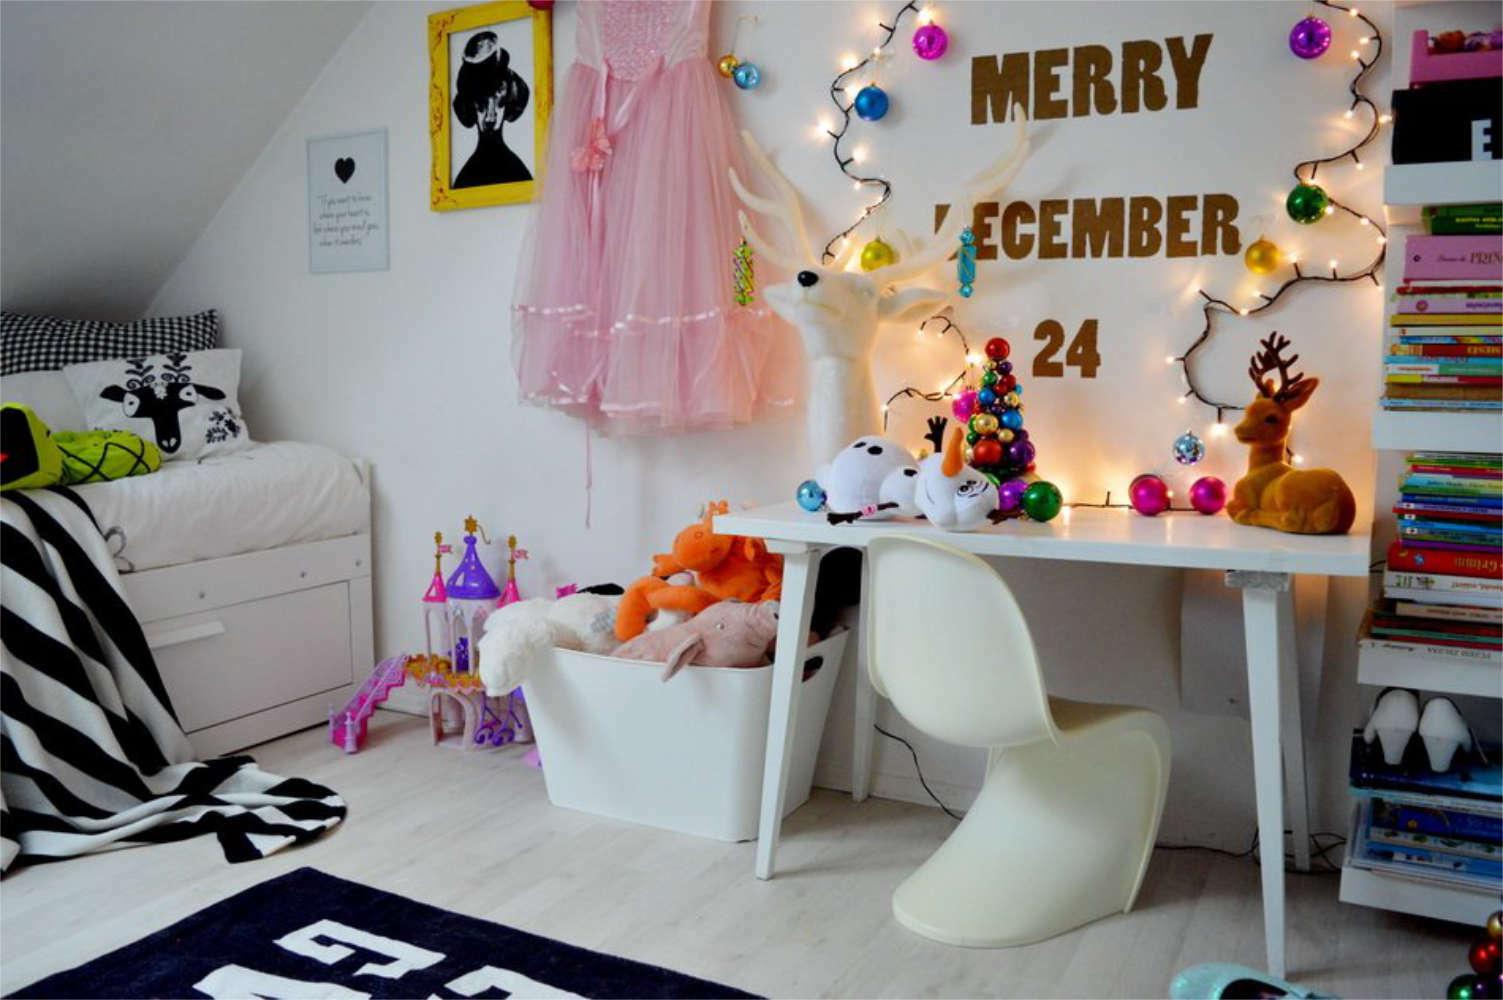 #gyerekszoba #decoration #childrenroom #colors #xmas